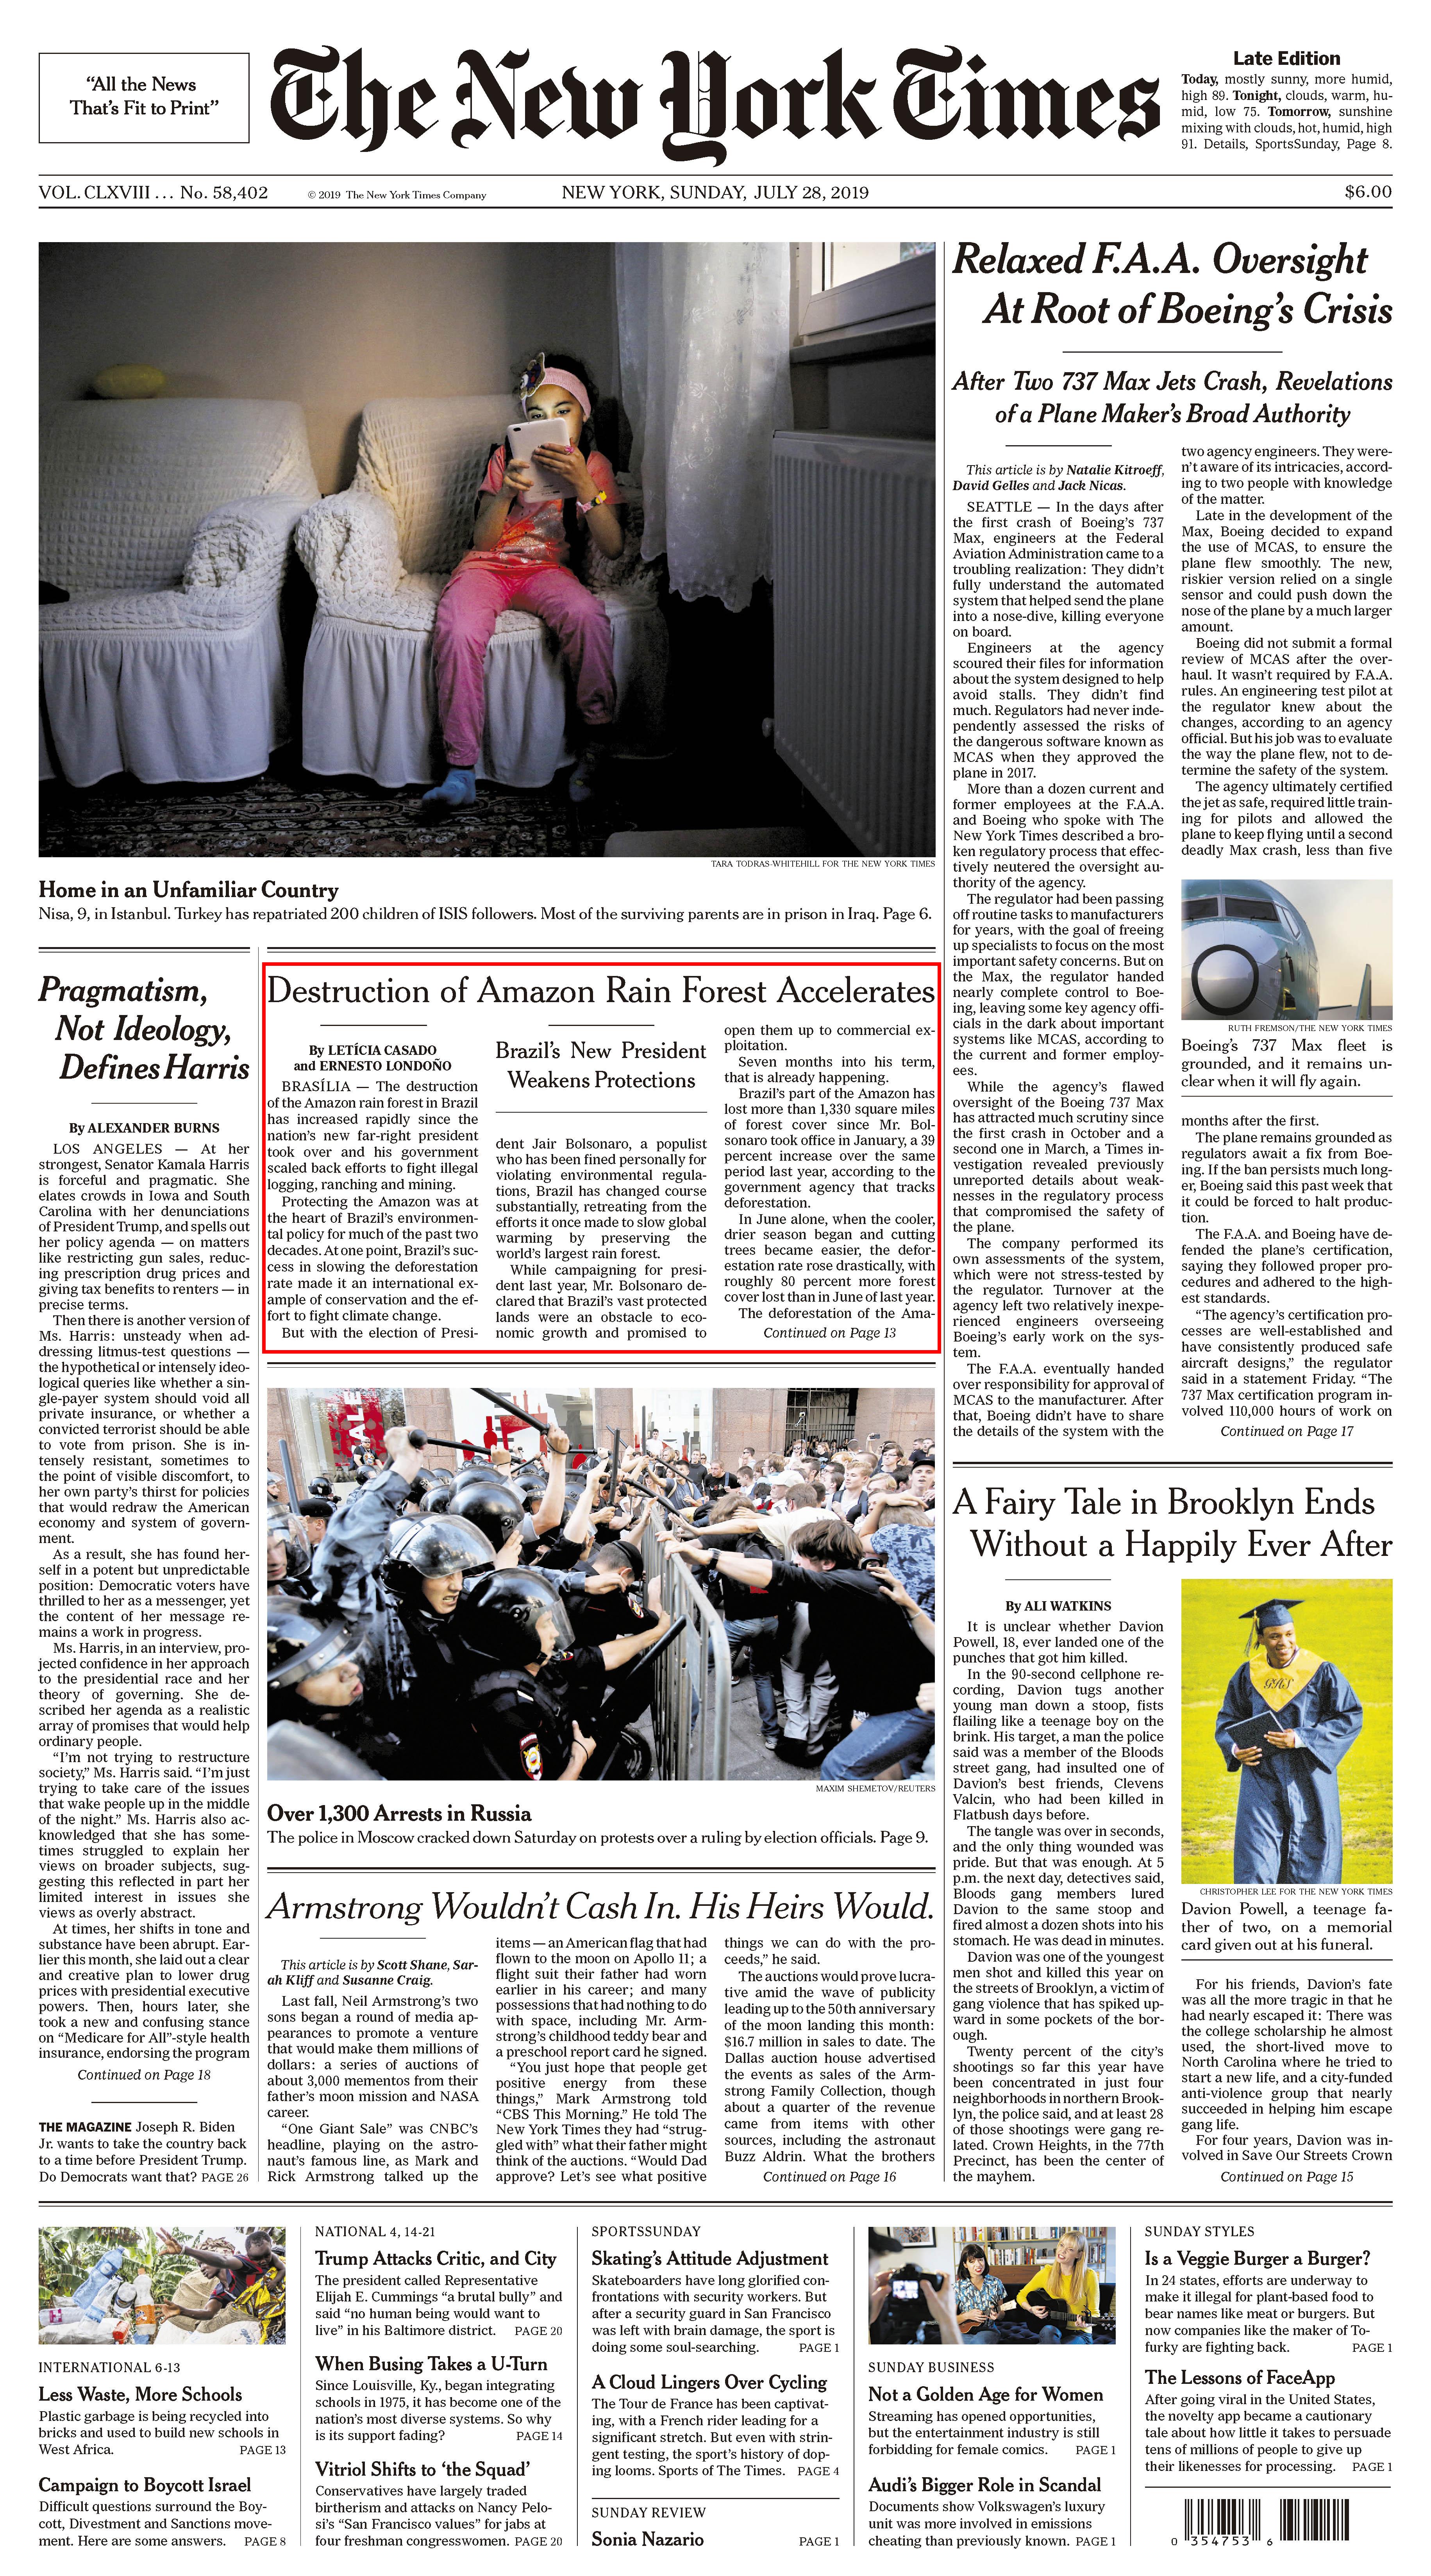 Capa do The New York Times denuncia negligência do governo Bolsonaro na Amazônia.